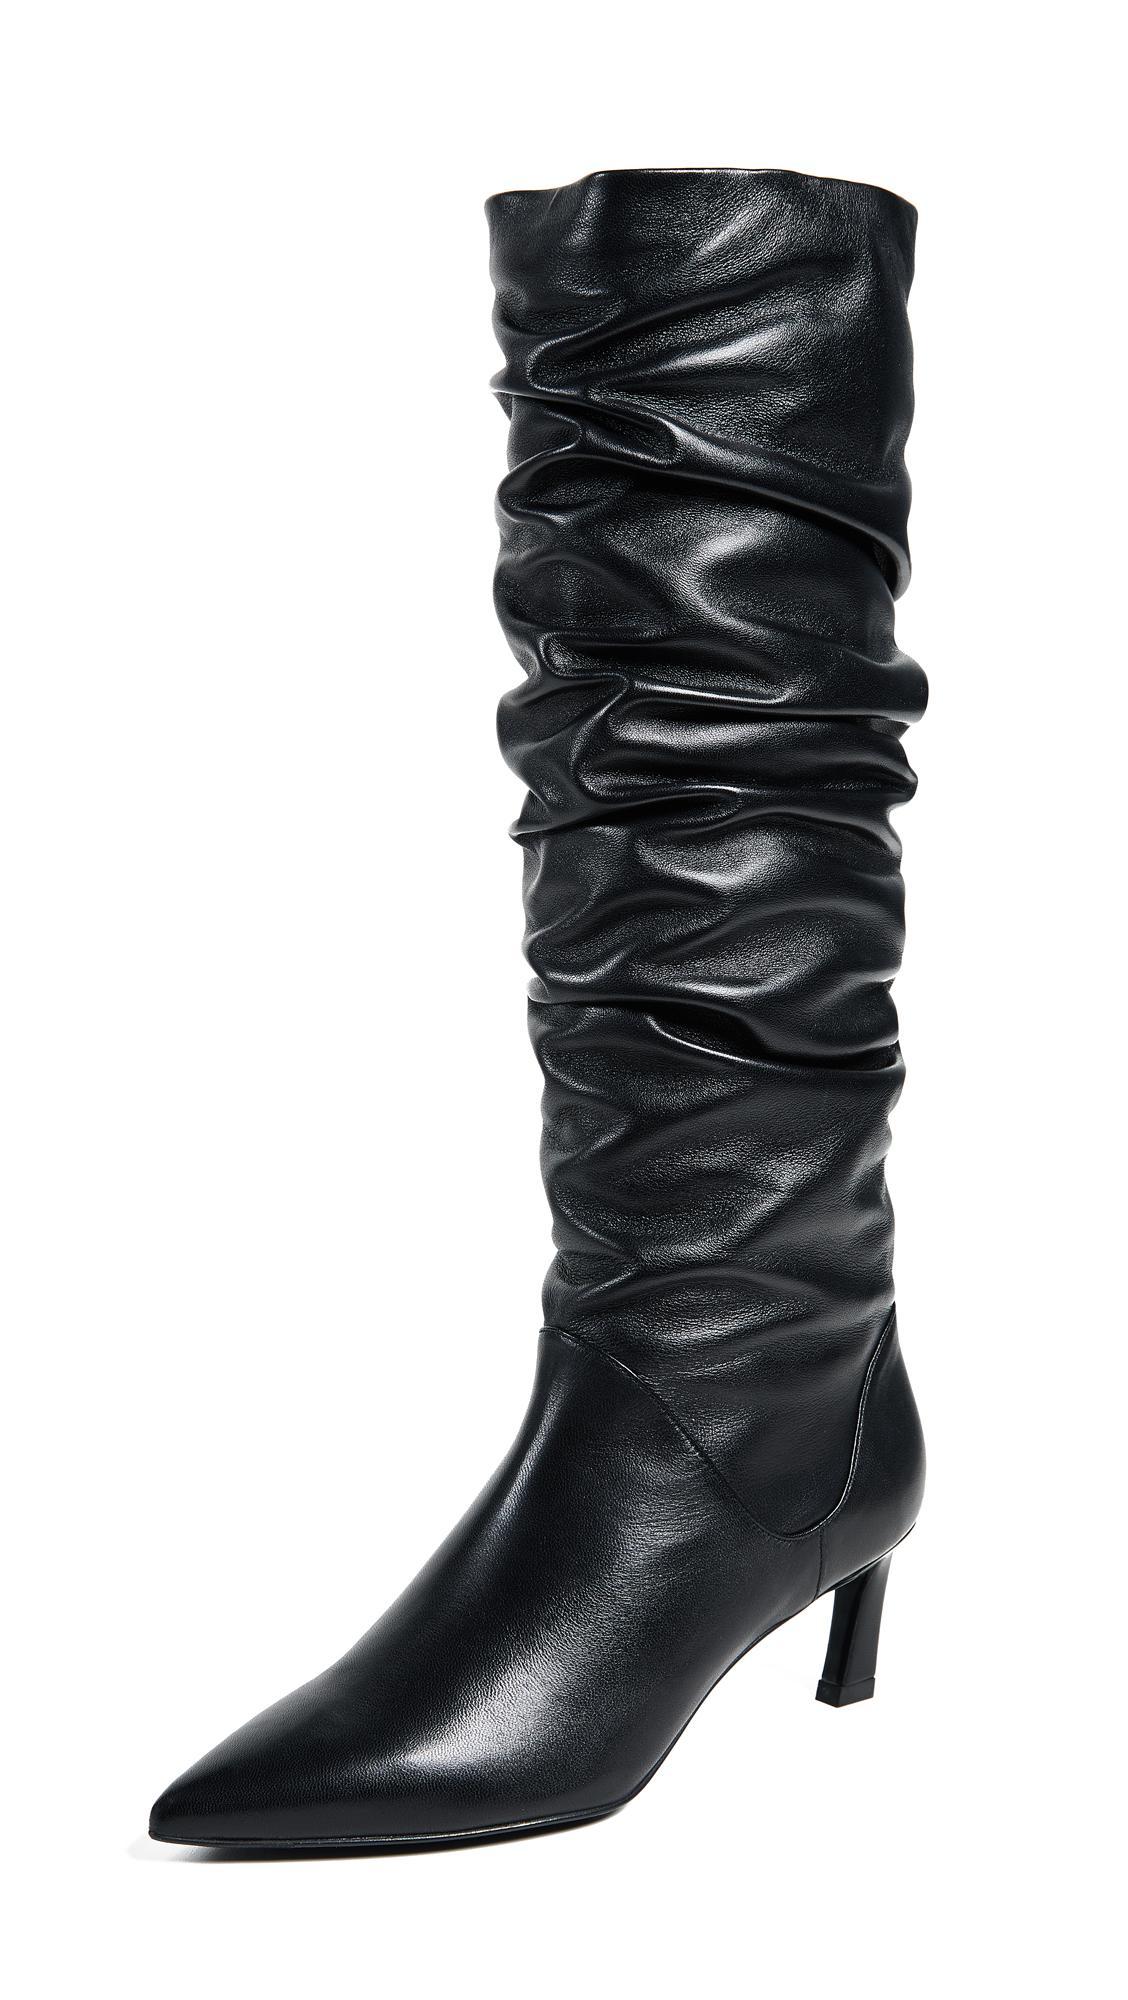 Stuart Weitzman Leather Benatar Tall Scrunch Boots in Black